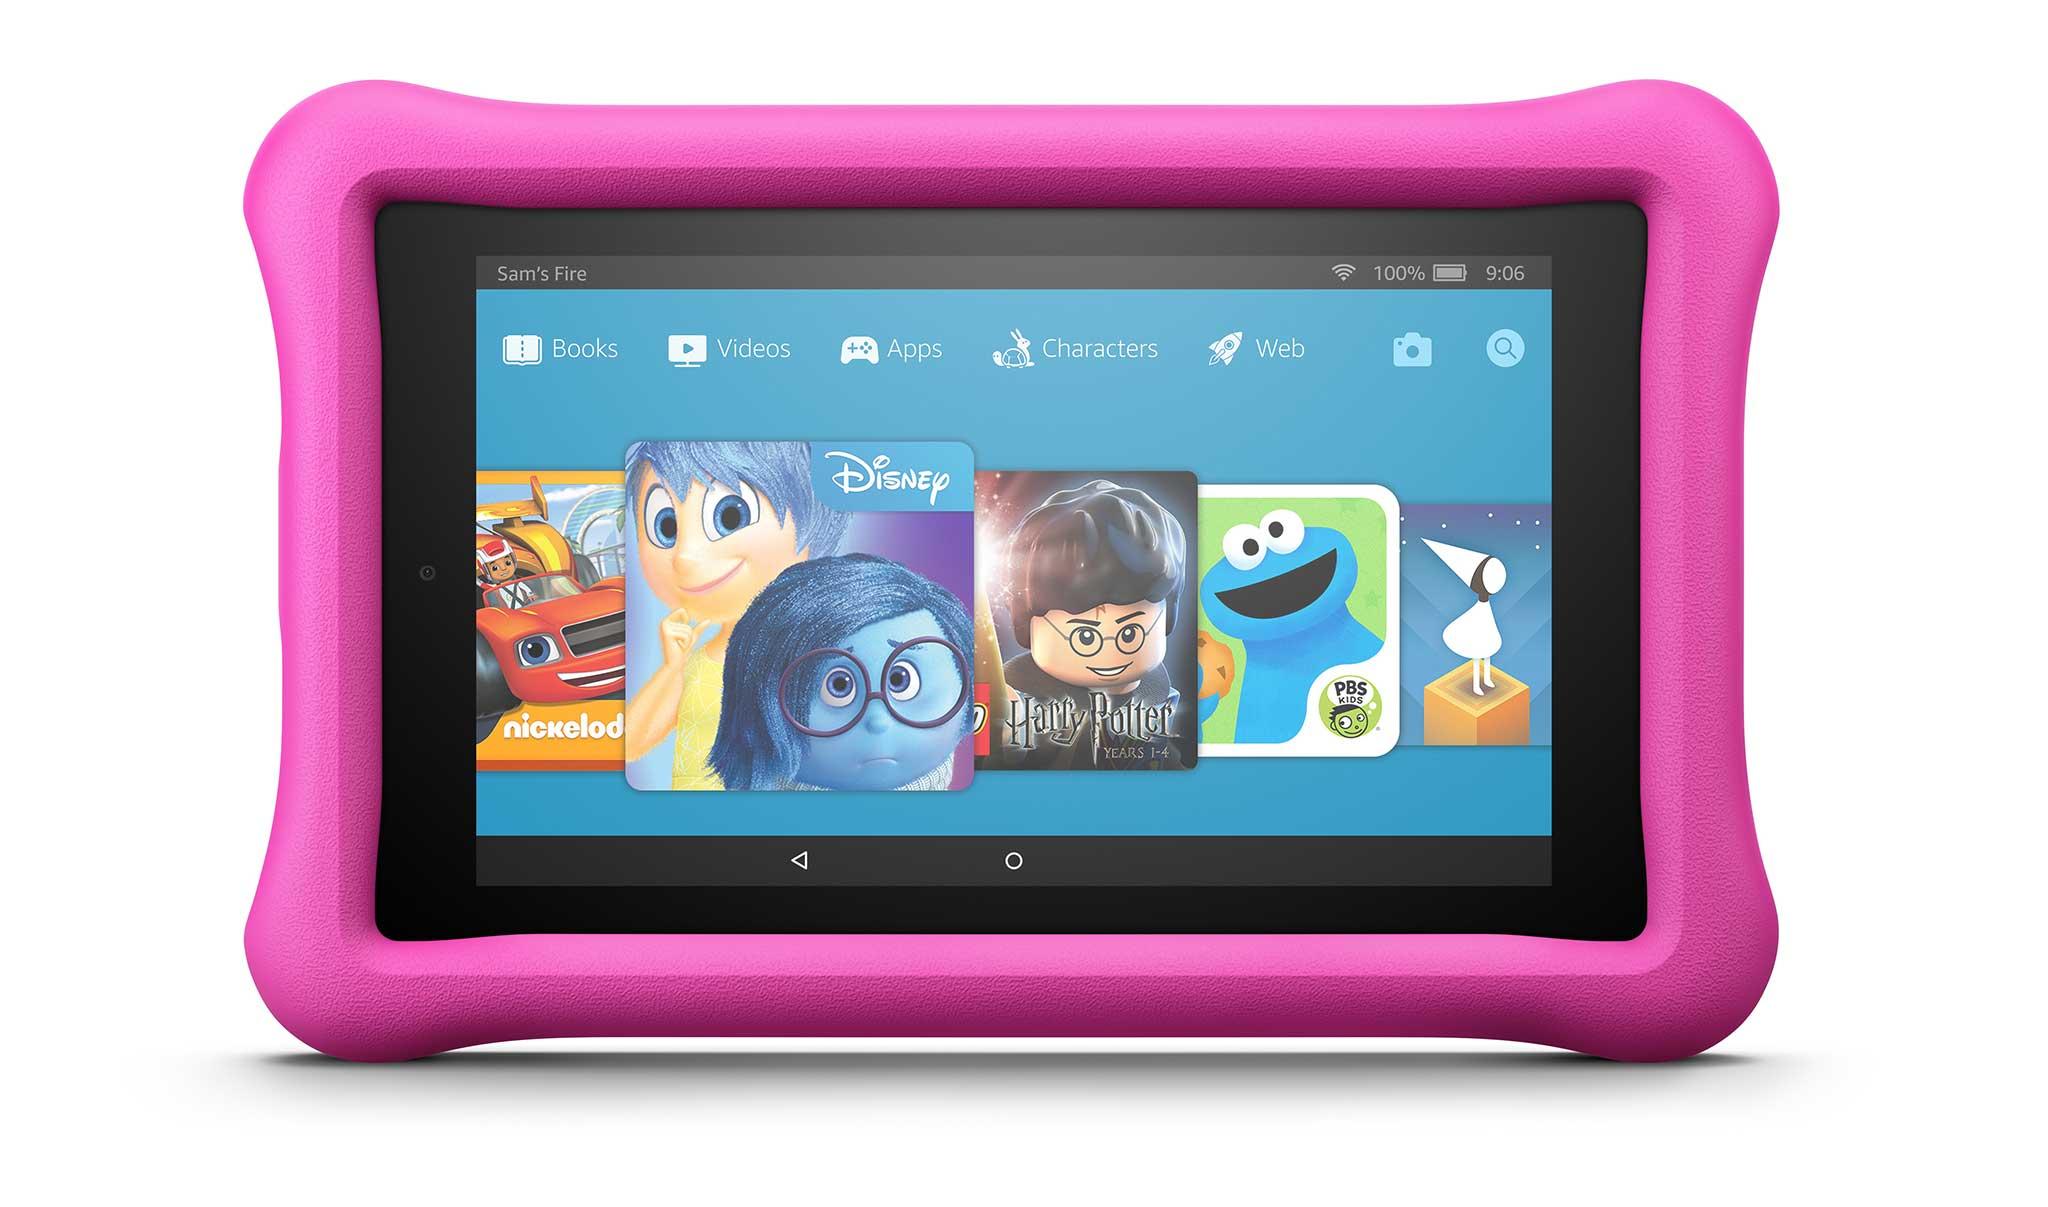 Fire-HD-8-Kids-Edition-Pink.jpg